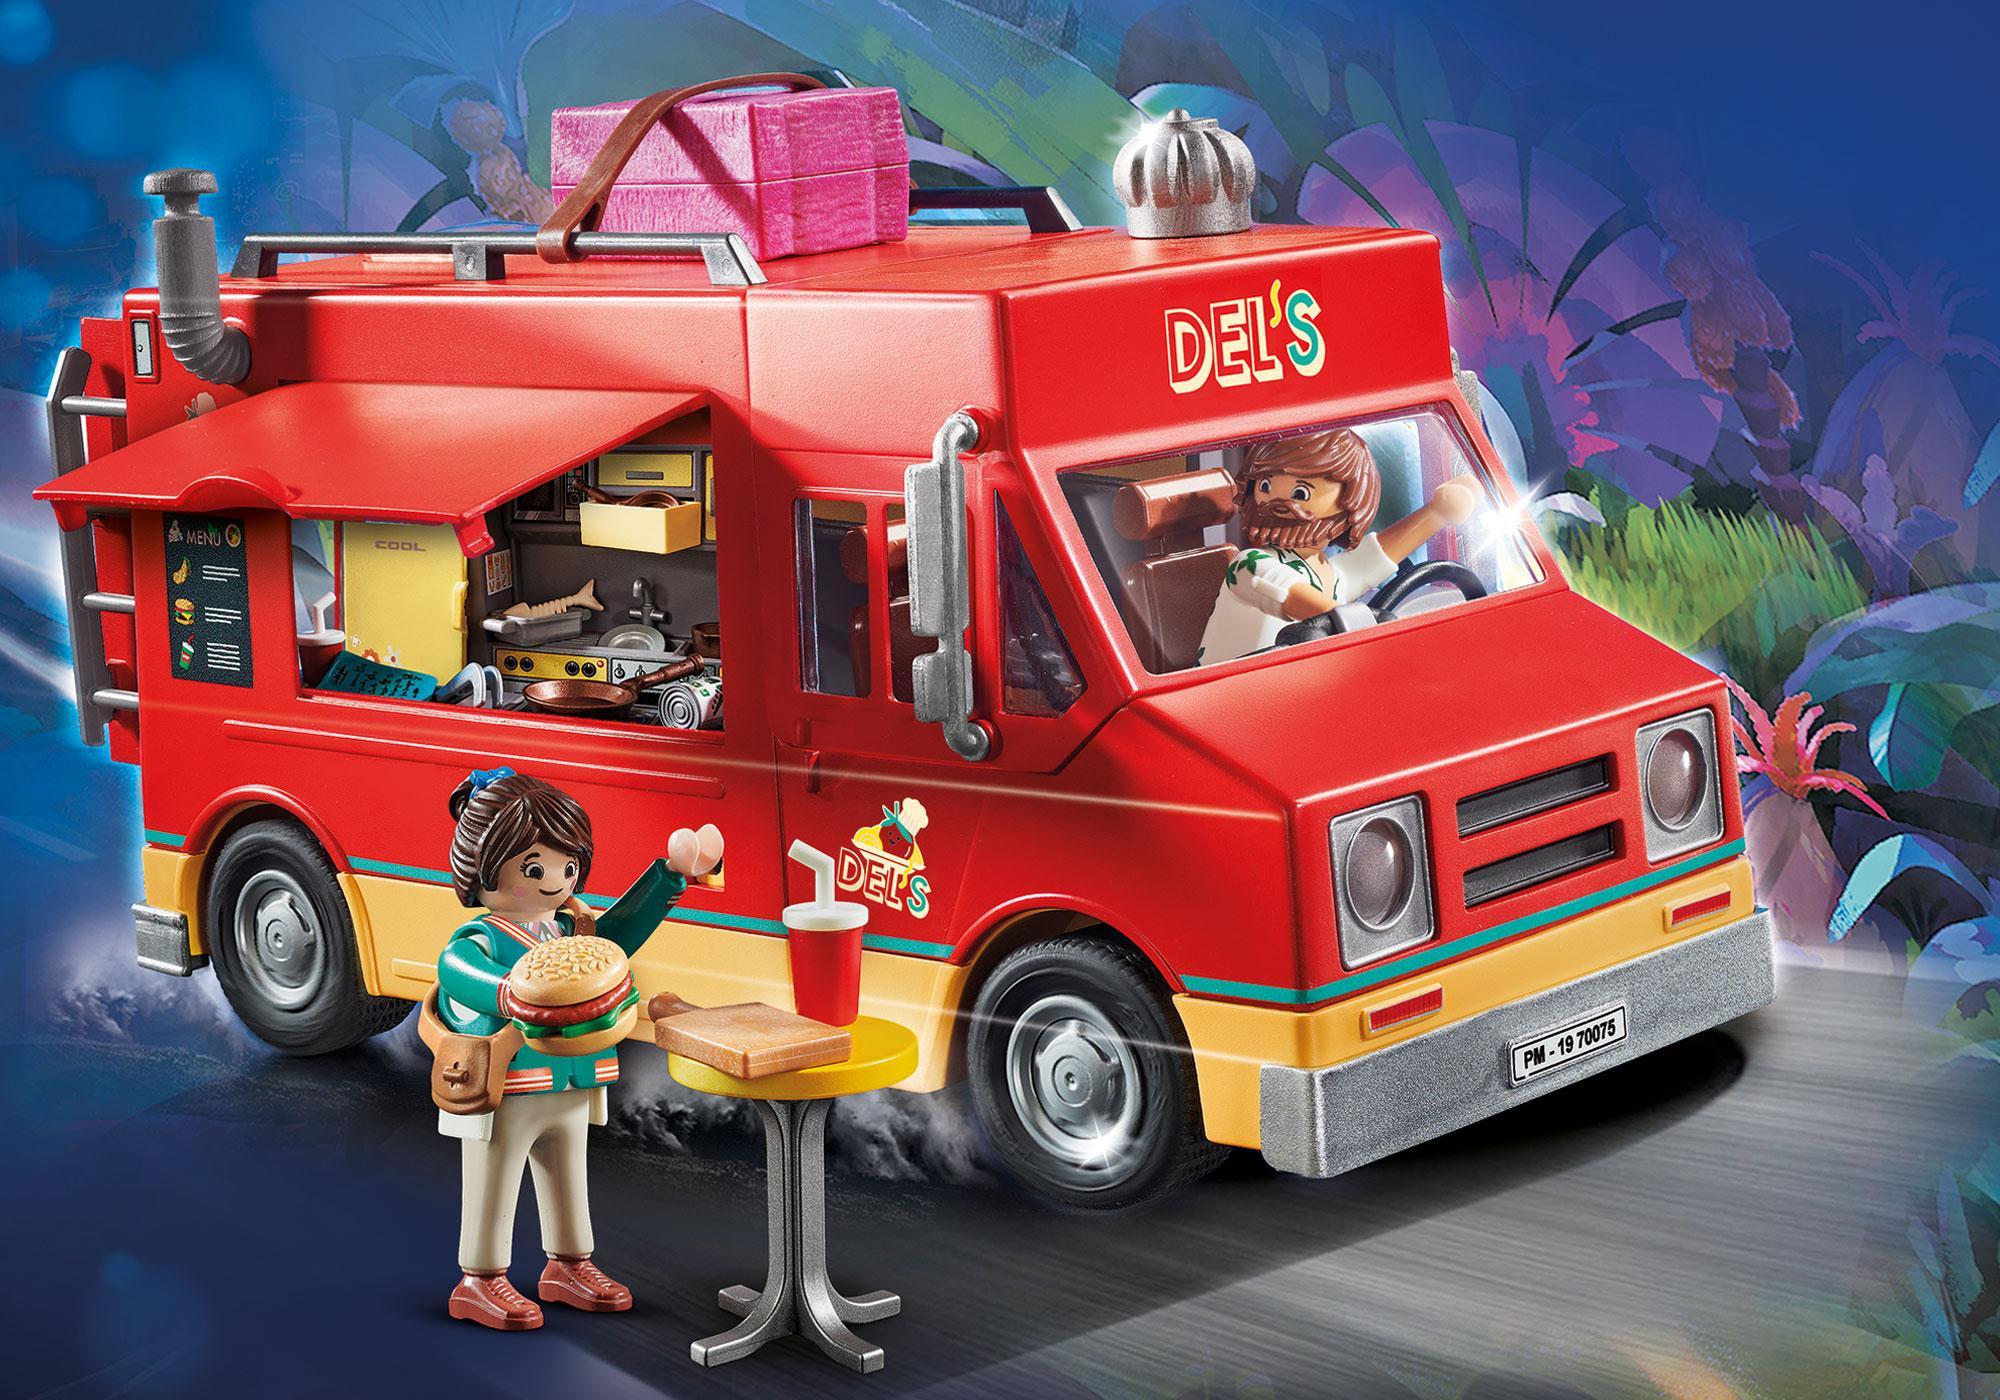 http://media.playmobil.com/i/playmobil/70075_product_detail/PLAYMOBIL: THE MOVIE Del's Food truck